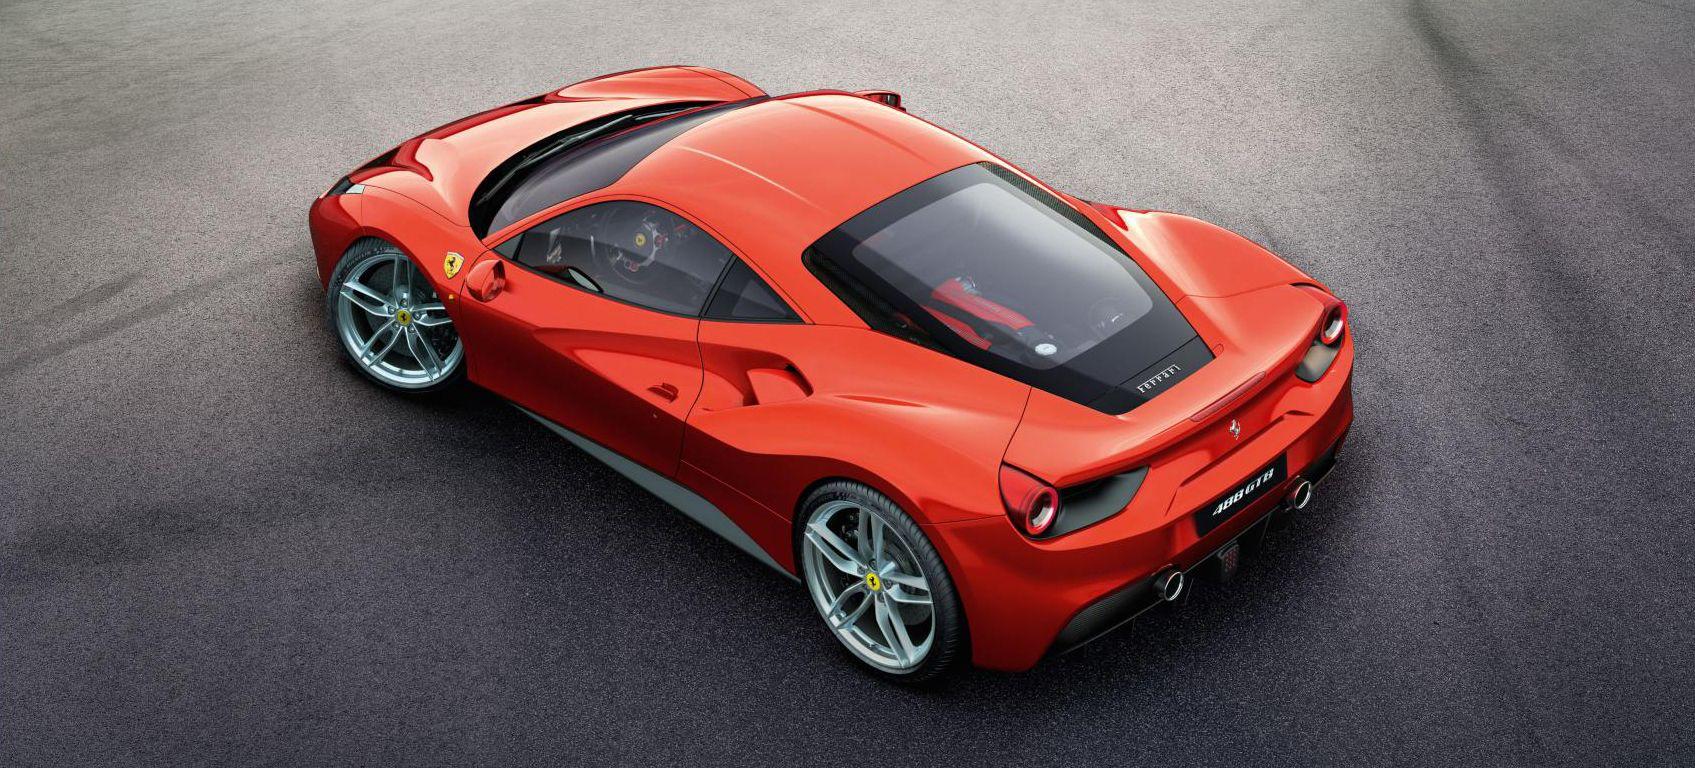 How Much Horsepower Does The Ferrari 488 Gtb Have Ferrari 488 Ferrari Car New Ferrari